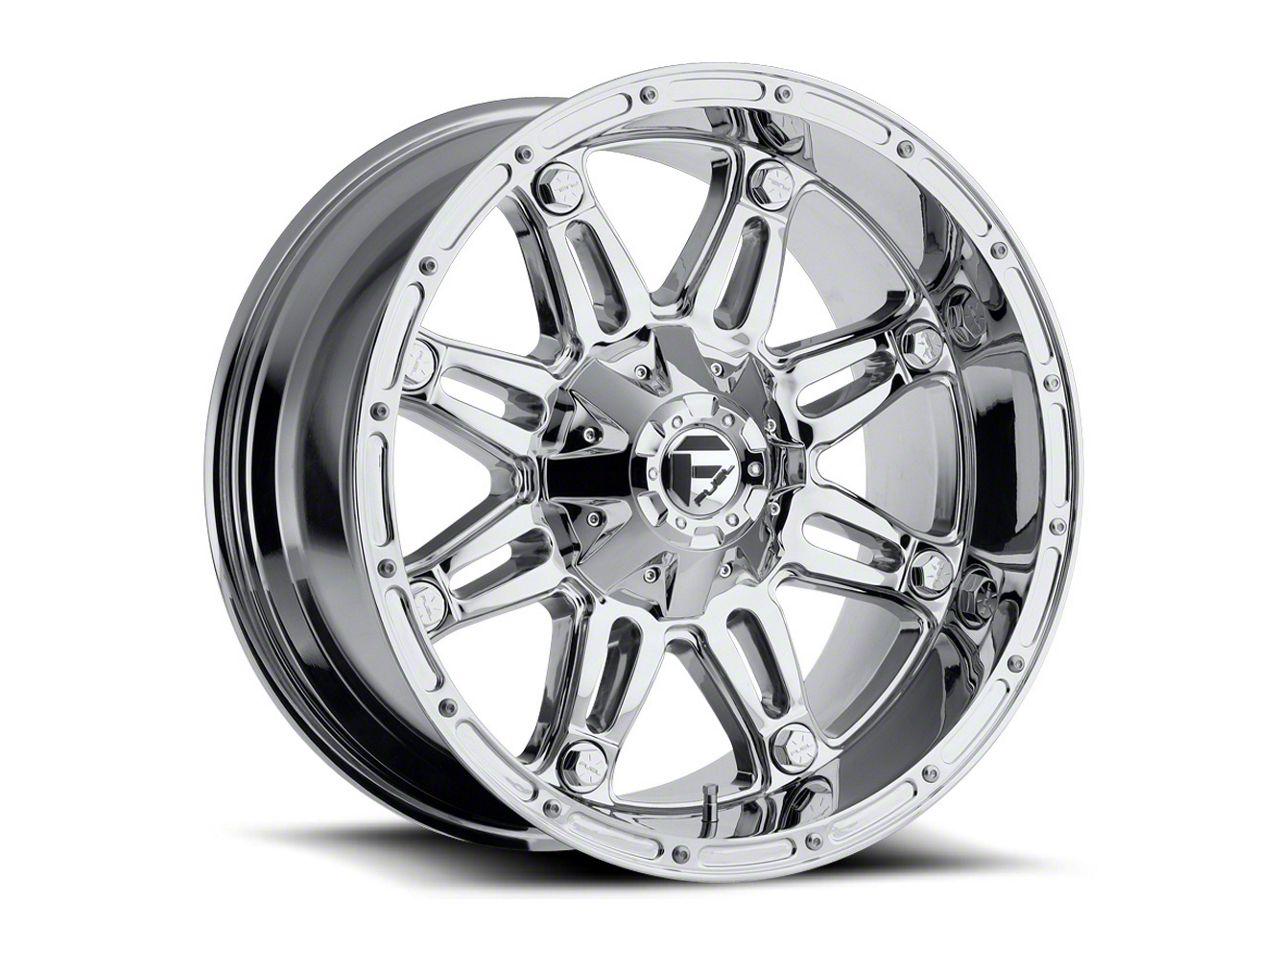 Fuel Wheels Hostage Chrome 6-Lug Wheel - 18x12 (99-18 Silverado 1500)